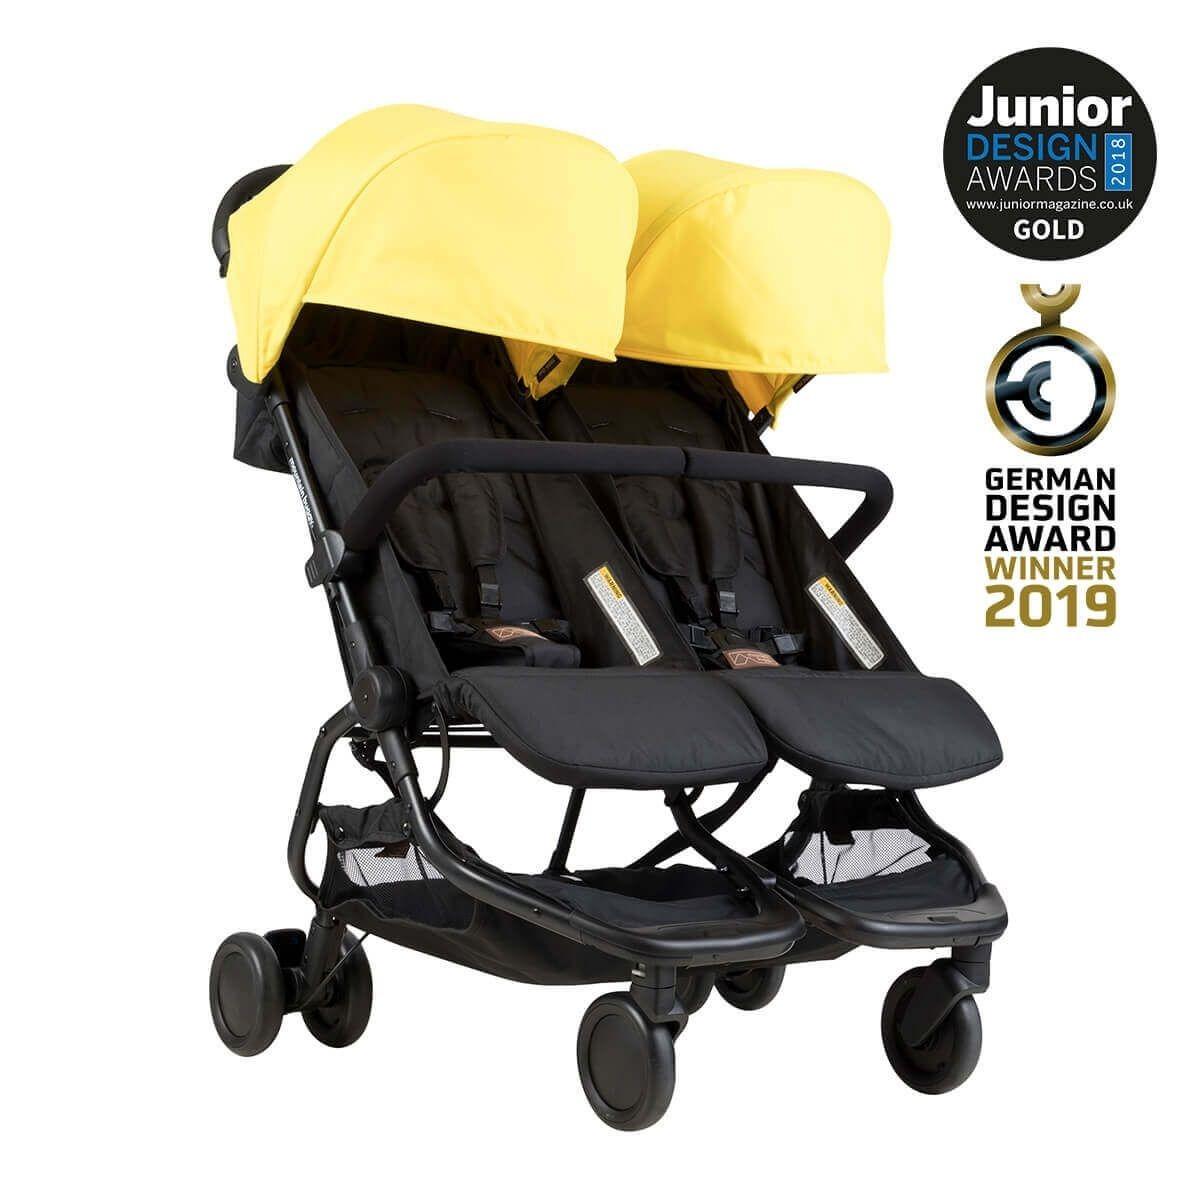 MountainBuggy Nano Duo Double stroller